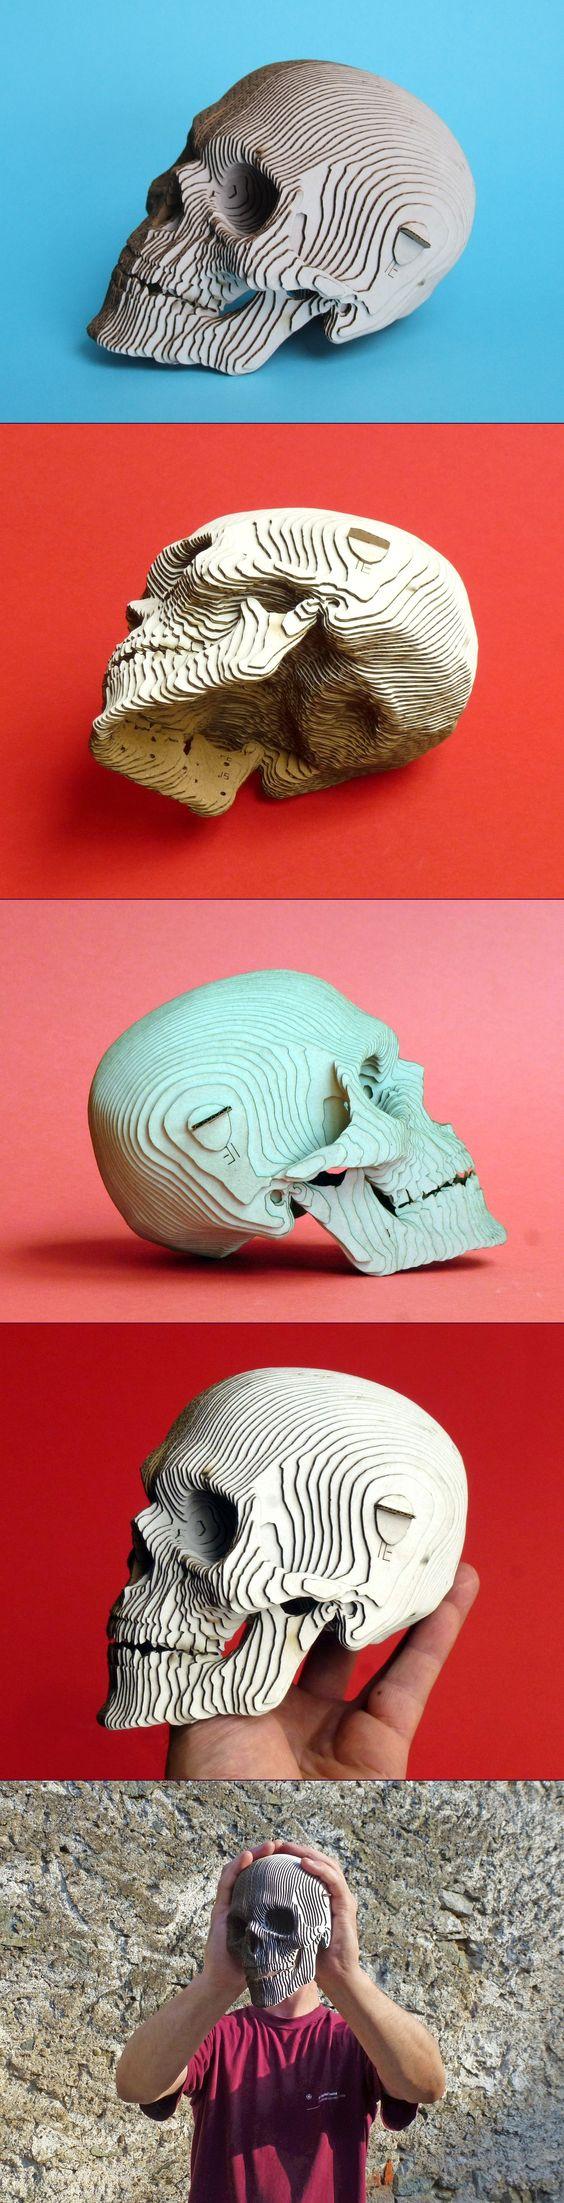 Skull 3D Lenmarco Laser, cardboard, laser cutting